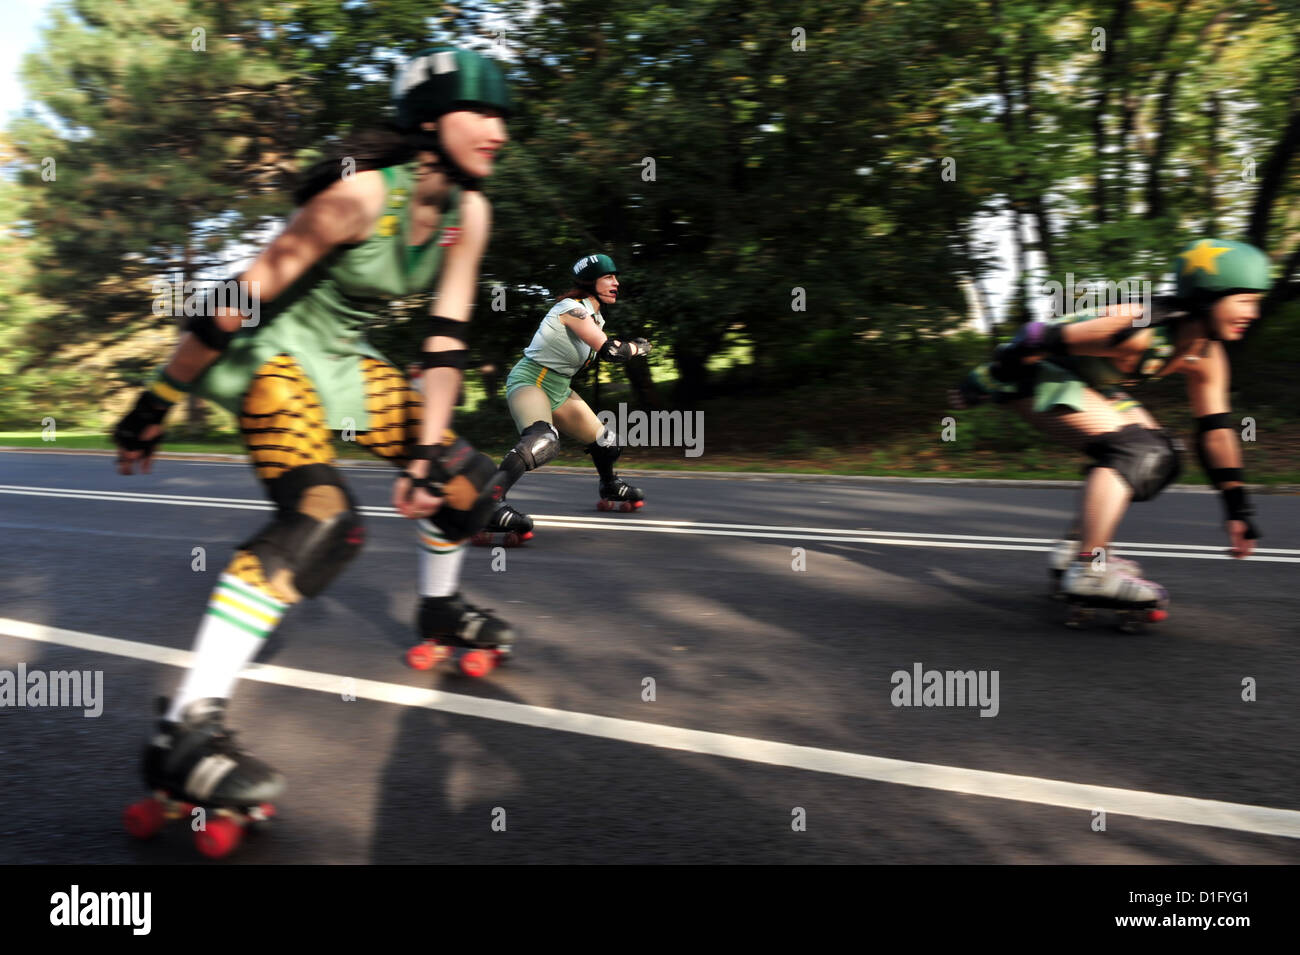 Roller skates york - Stock Photo Three Women Ride Roller Skates In Central Park In Manhattan New York